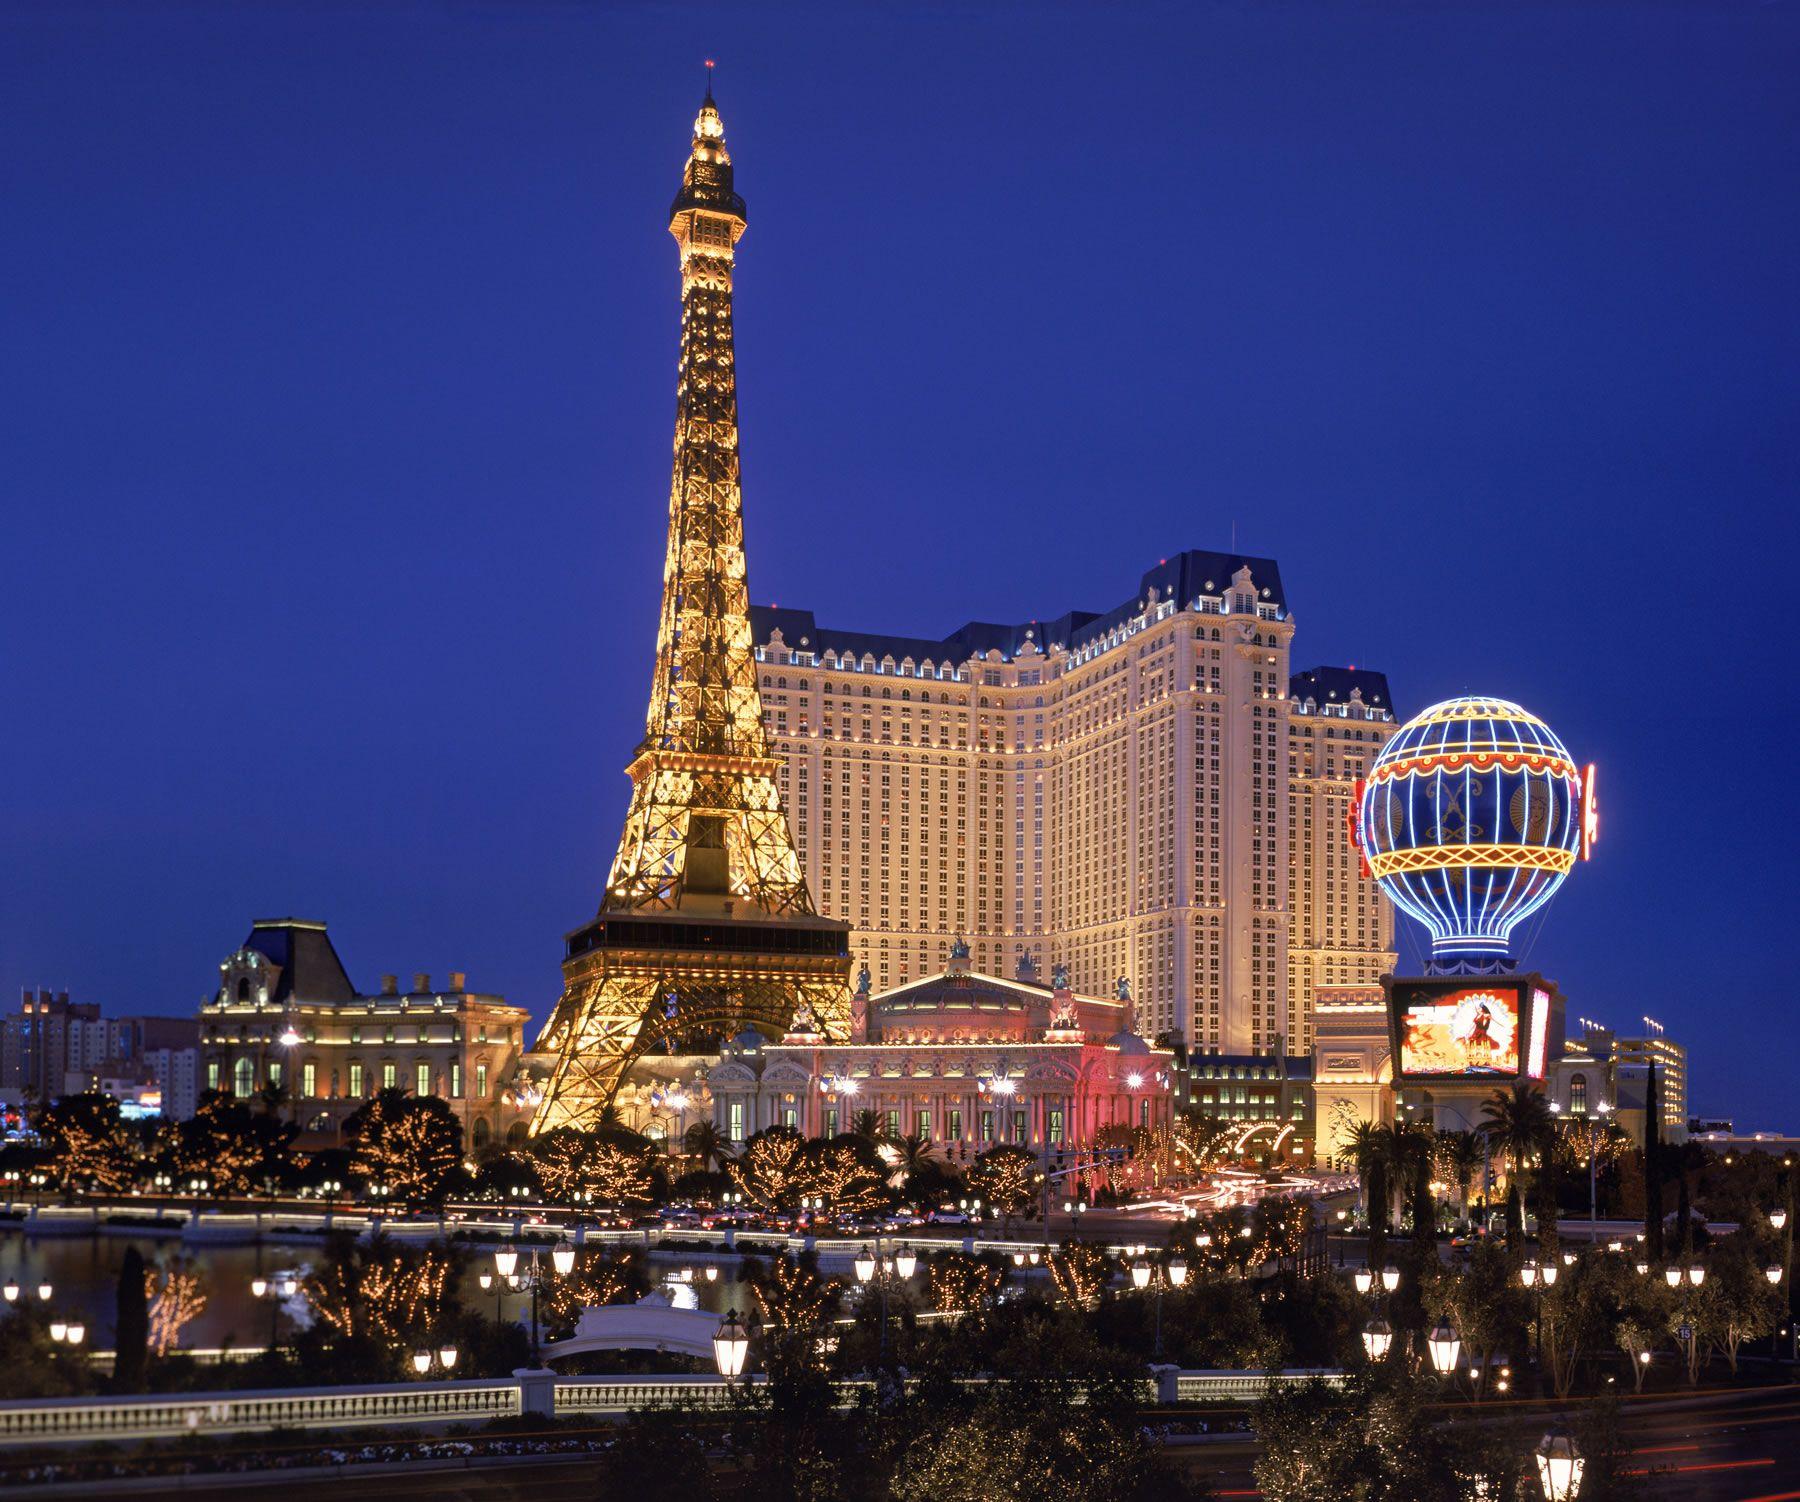 Paris Hotel Casino Las Vegas Nv With Images Las Vegas